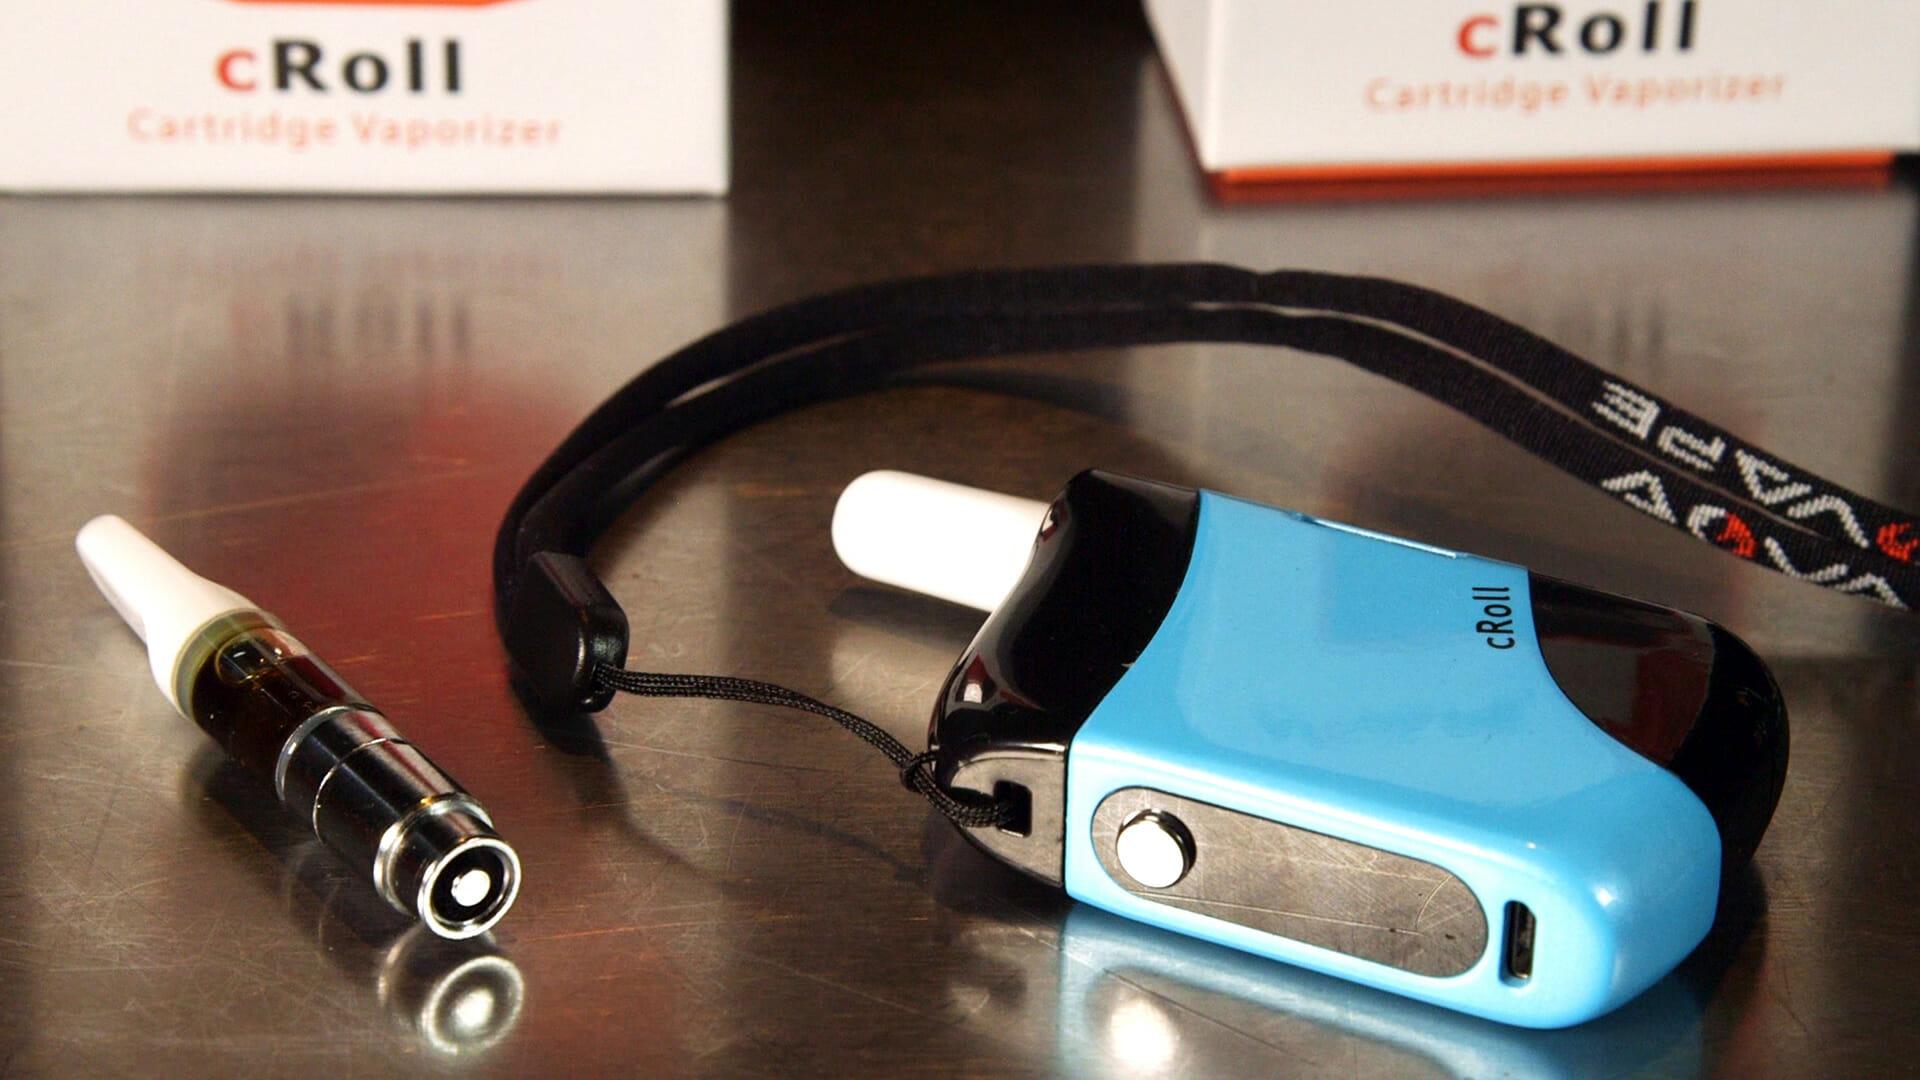 c-roll-cartridge-vaporizer-review-thumbnail-3